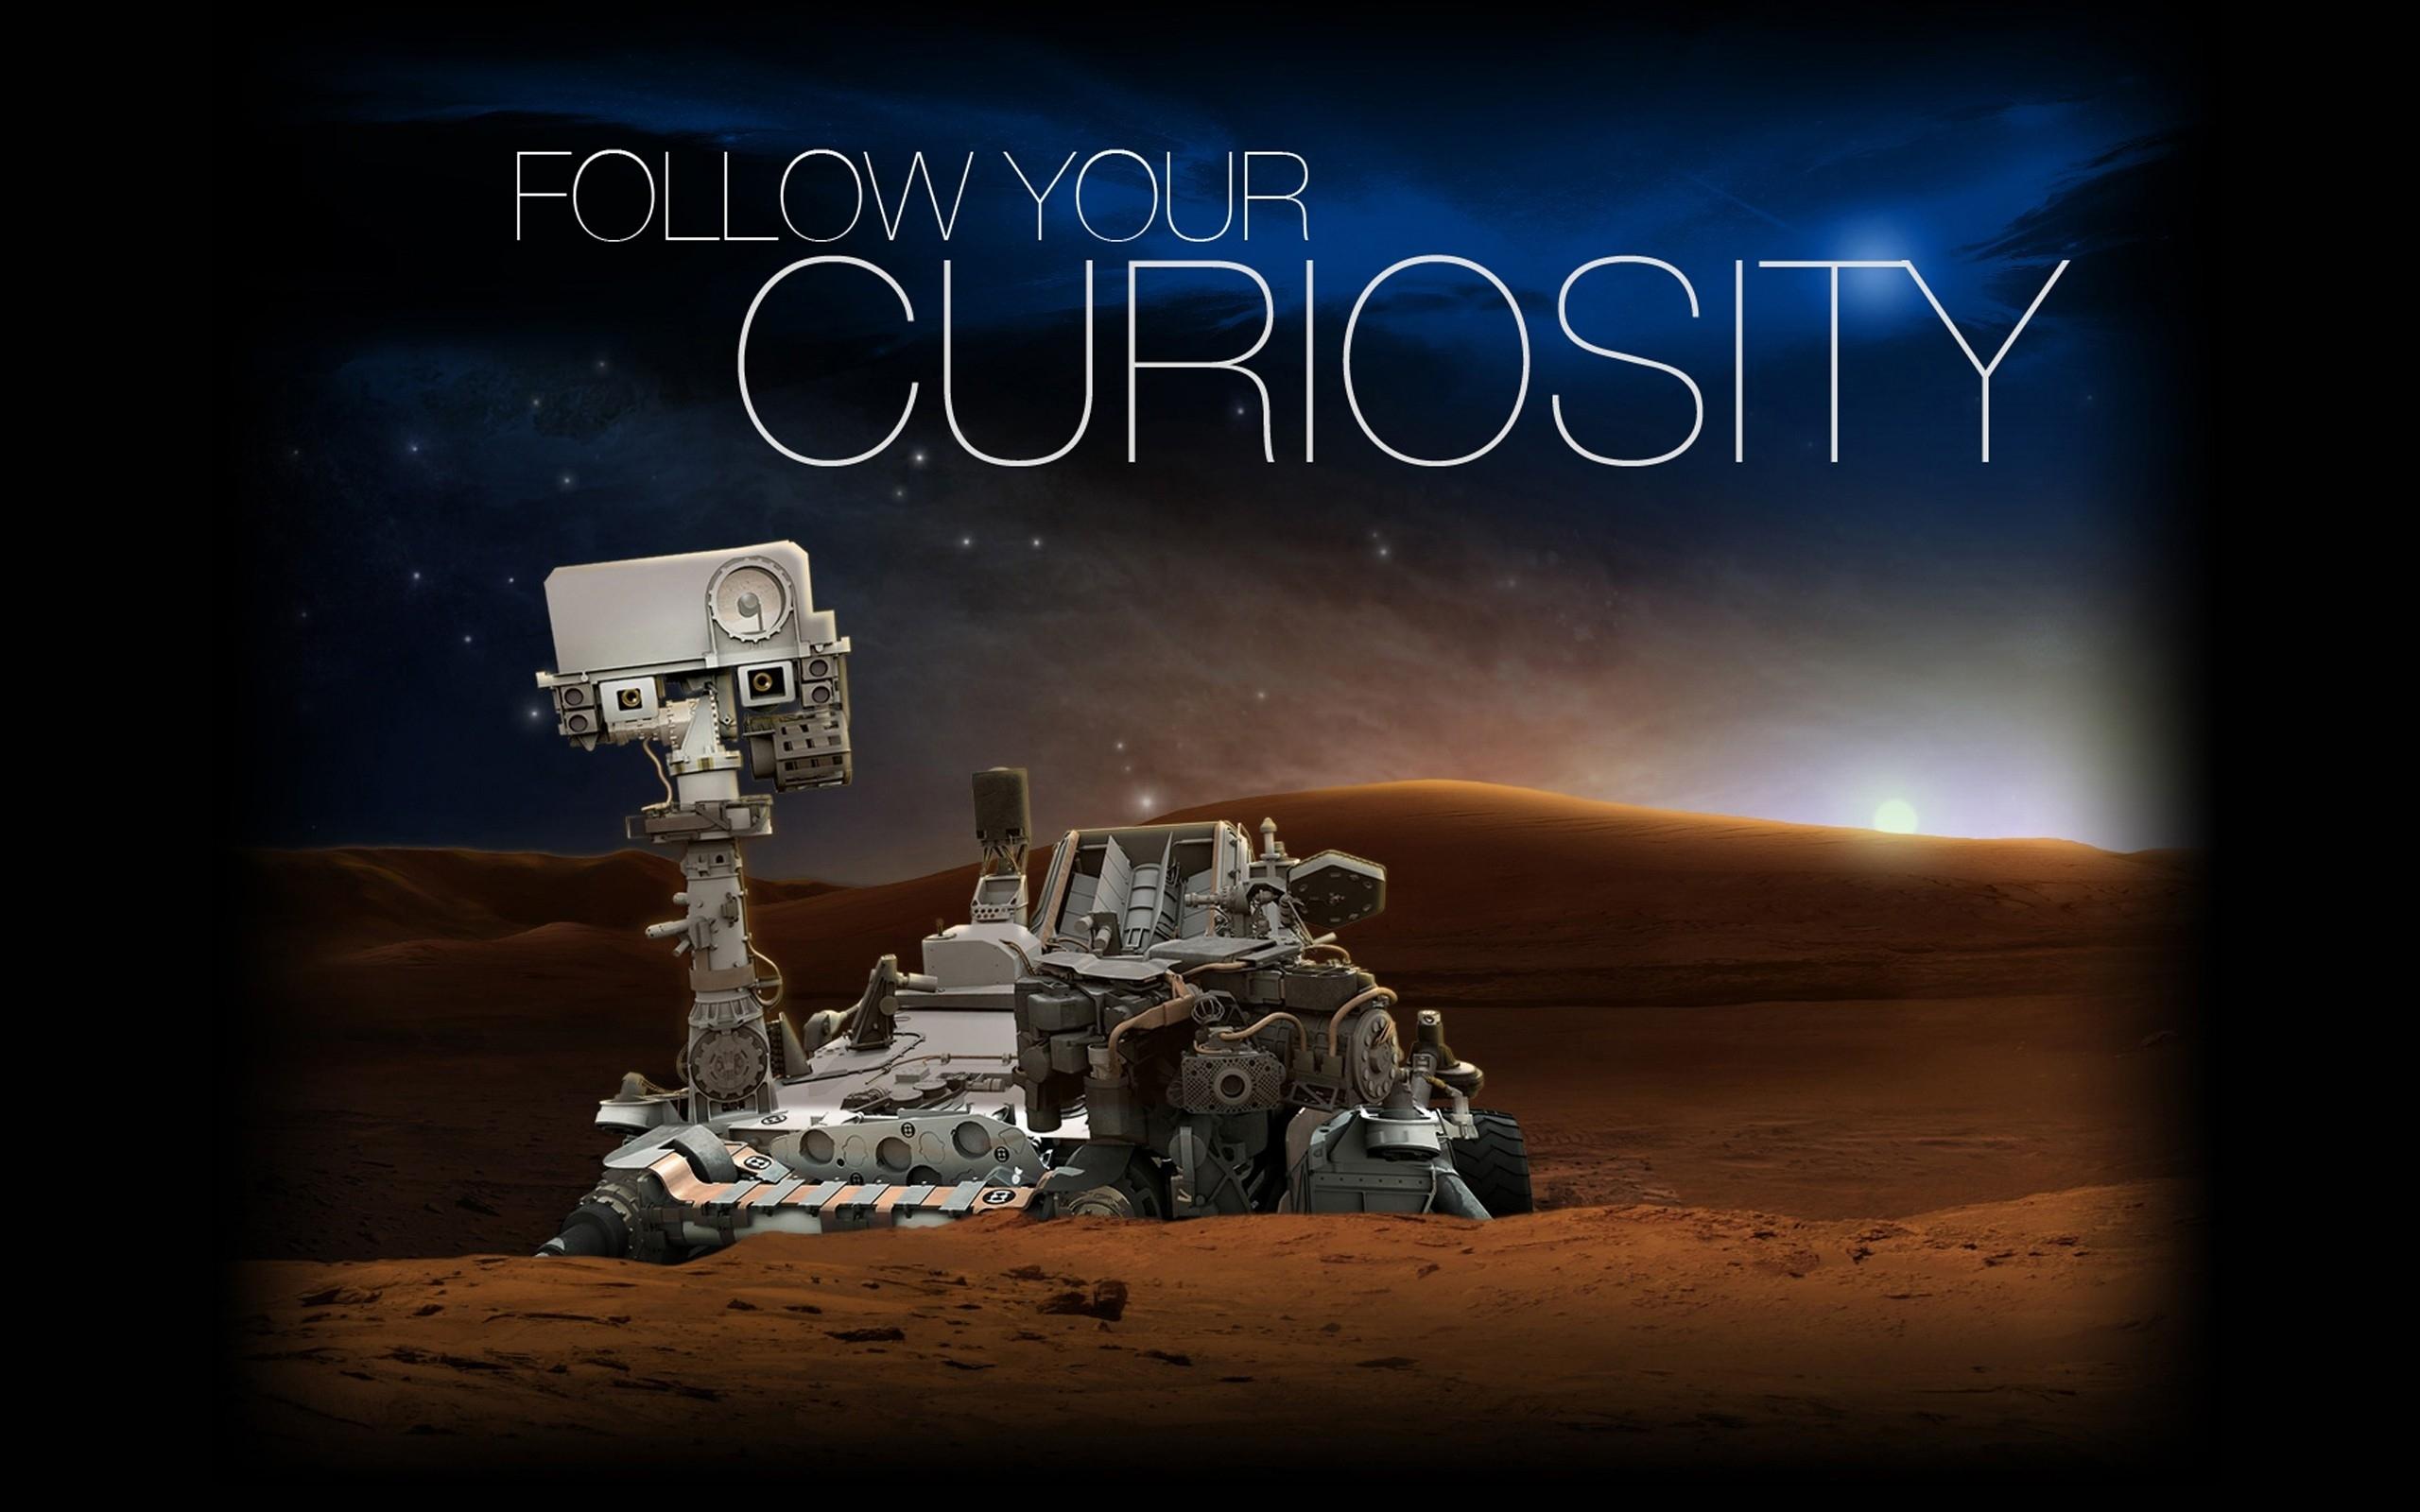 General 2560x1600 Mars Curiosity NASA Rover science space